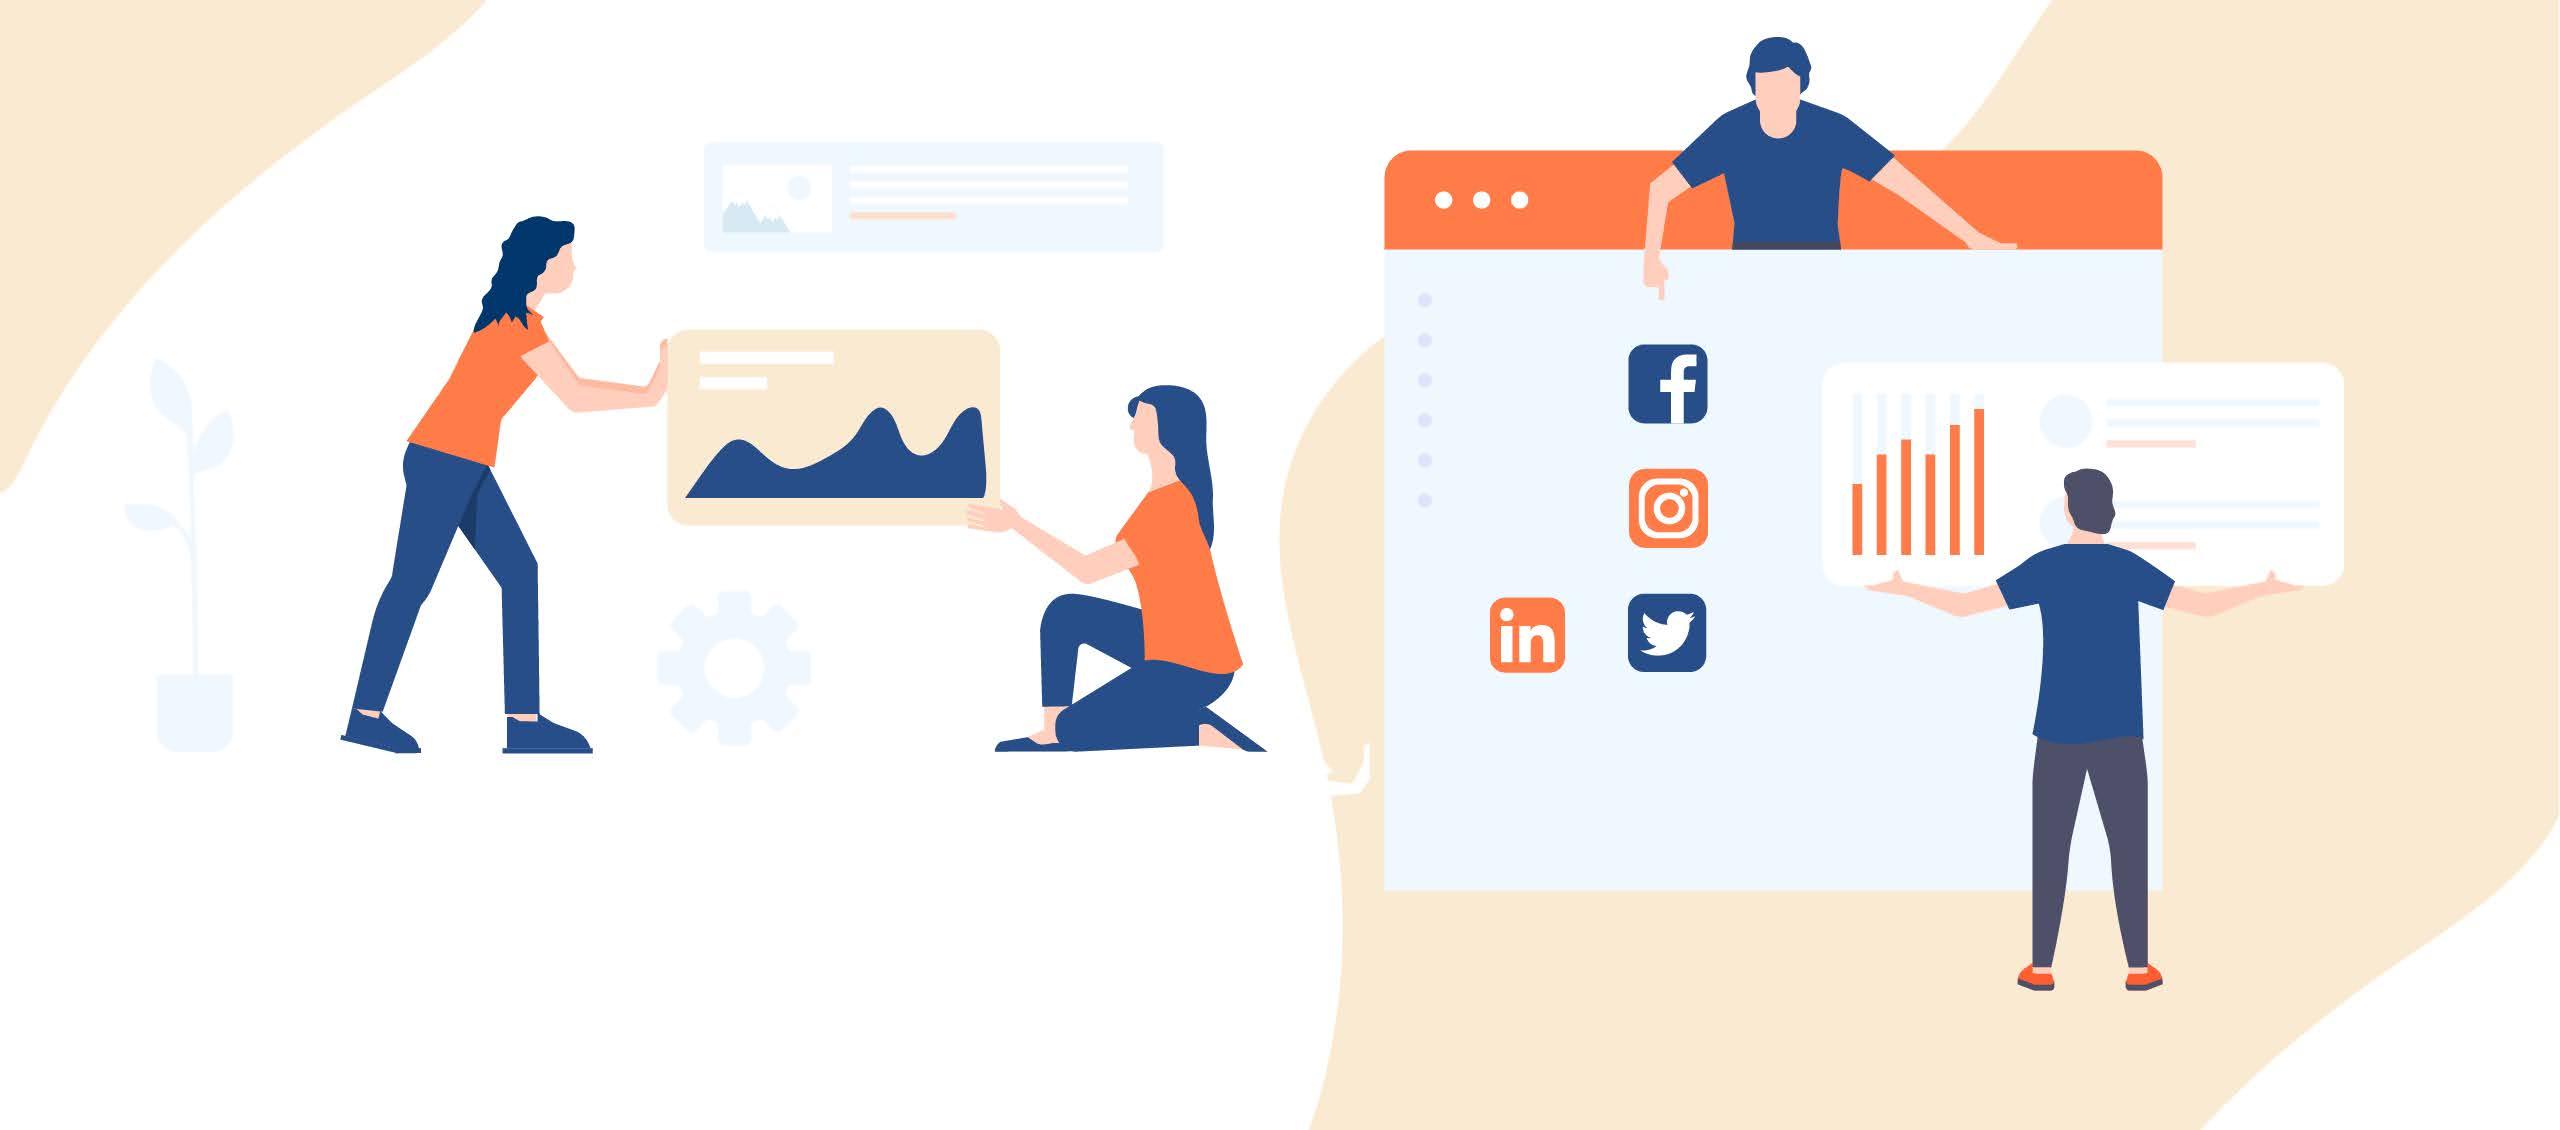 Agencies and social media